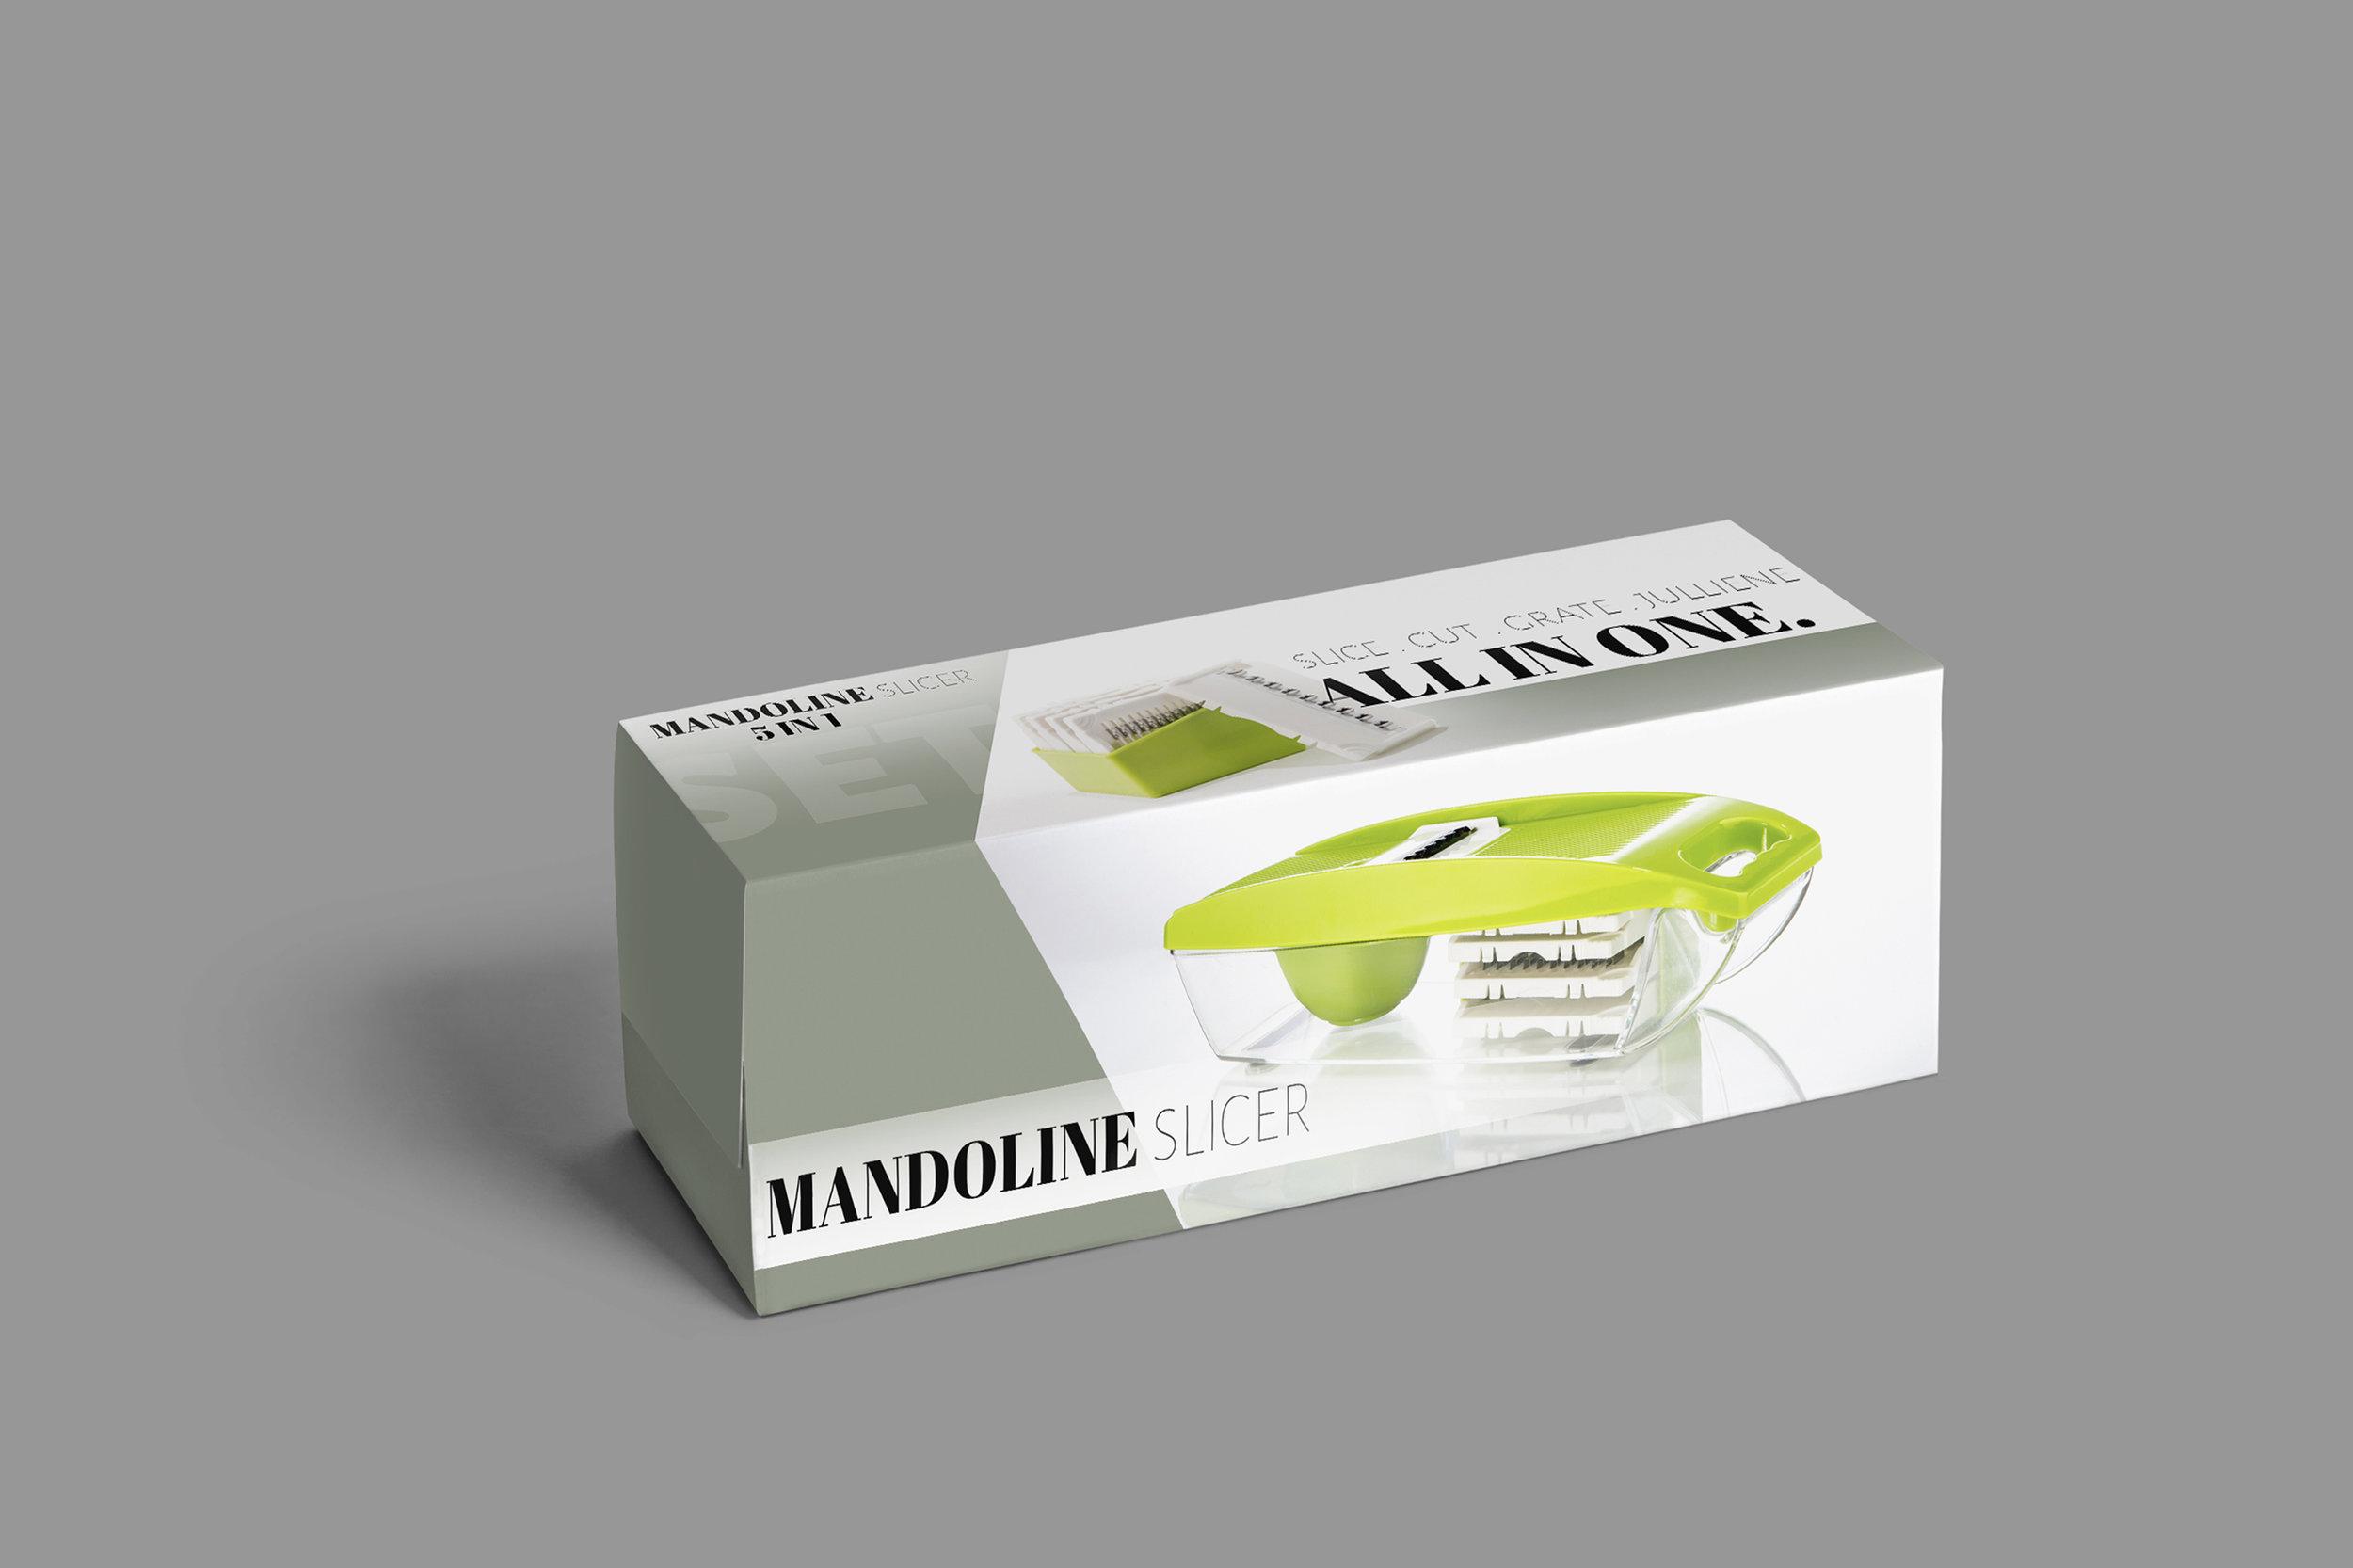 vertical-box-mockup-Mandoline.jpg